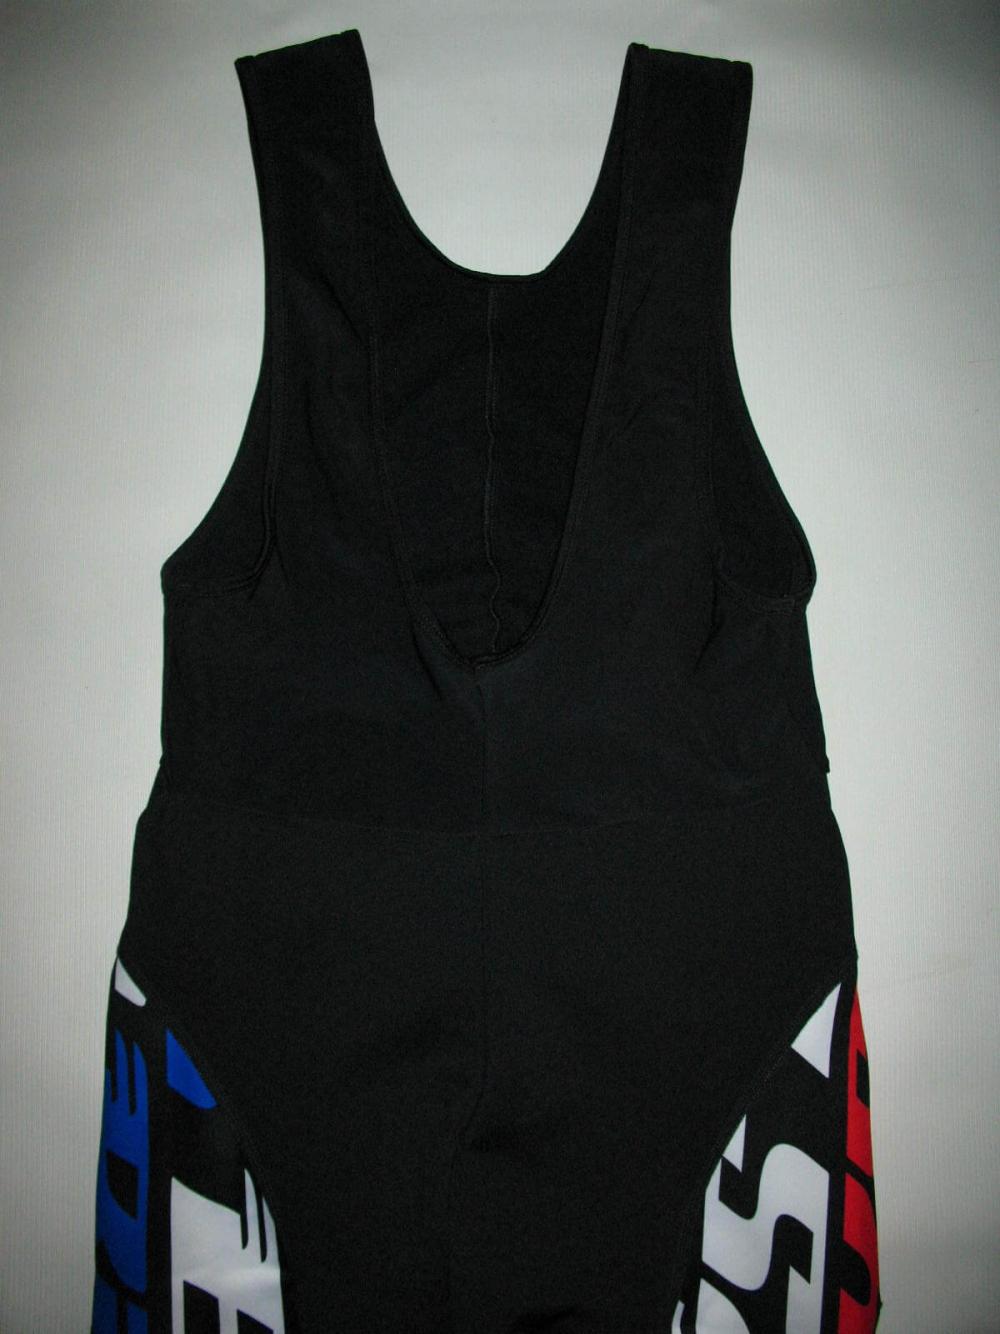 Велоштаны IXS bixs windstopper cycling pants (размер S/M) - 3